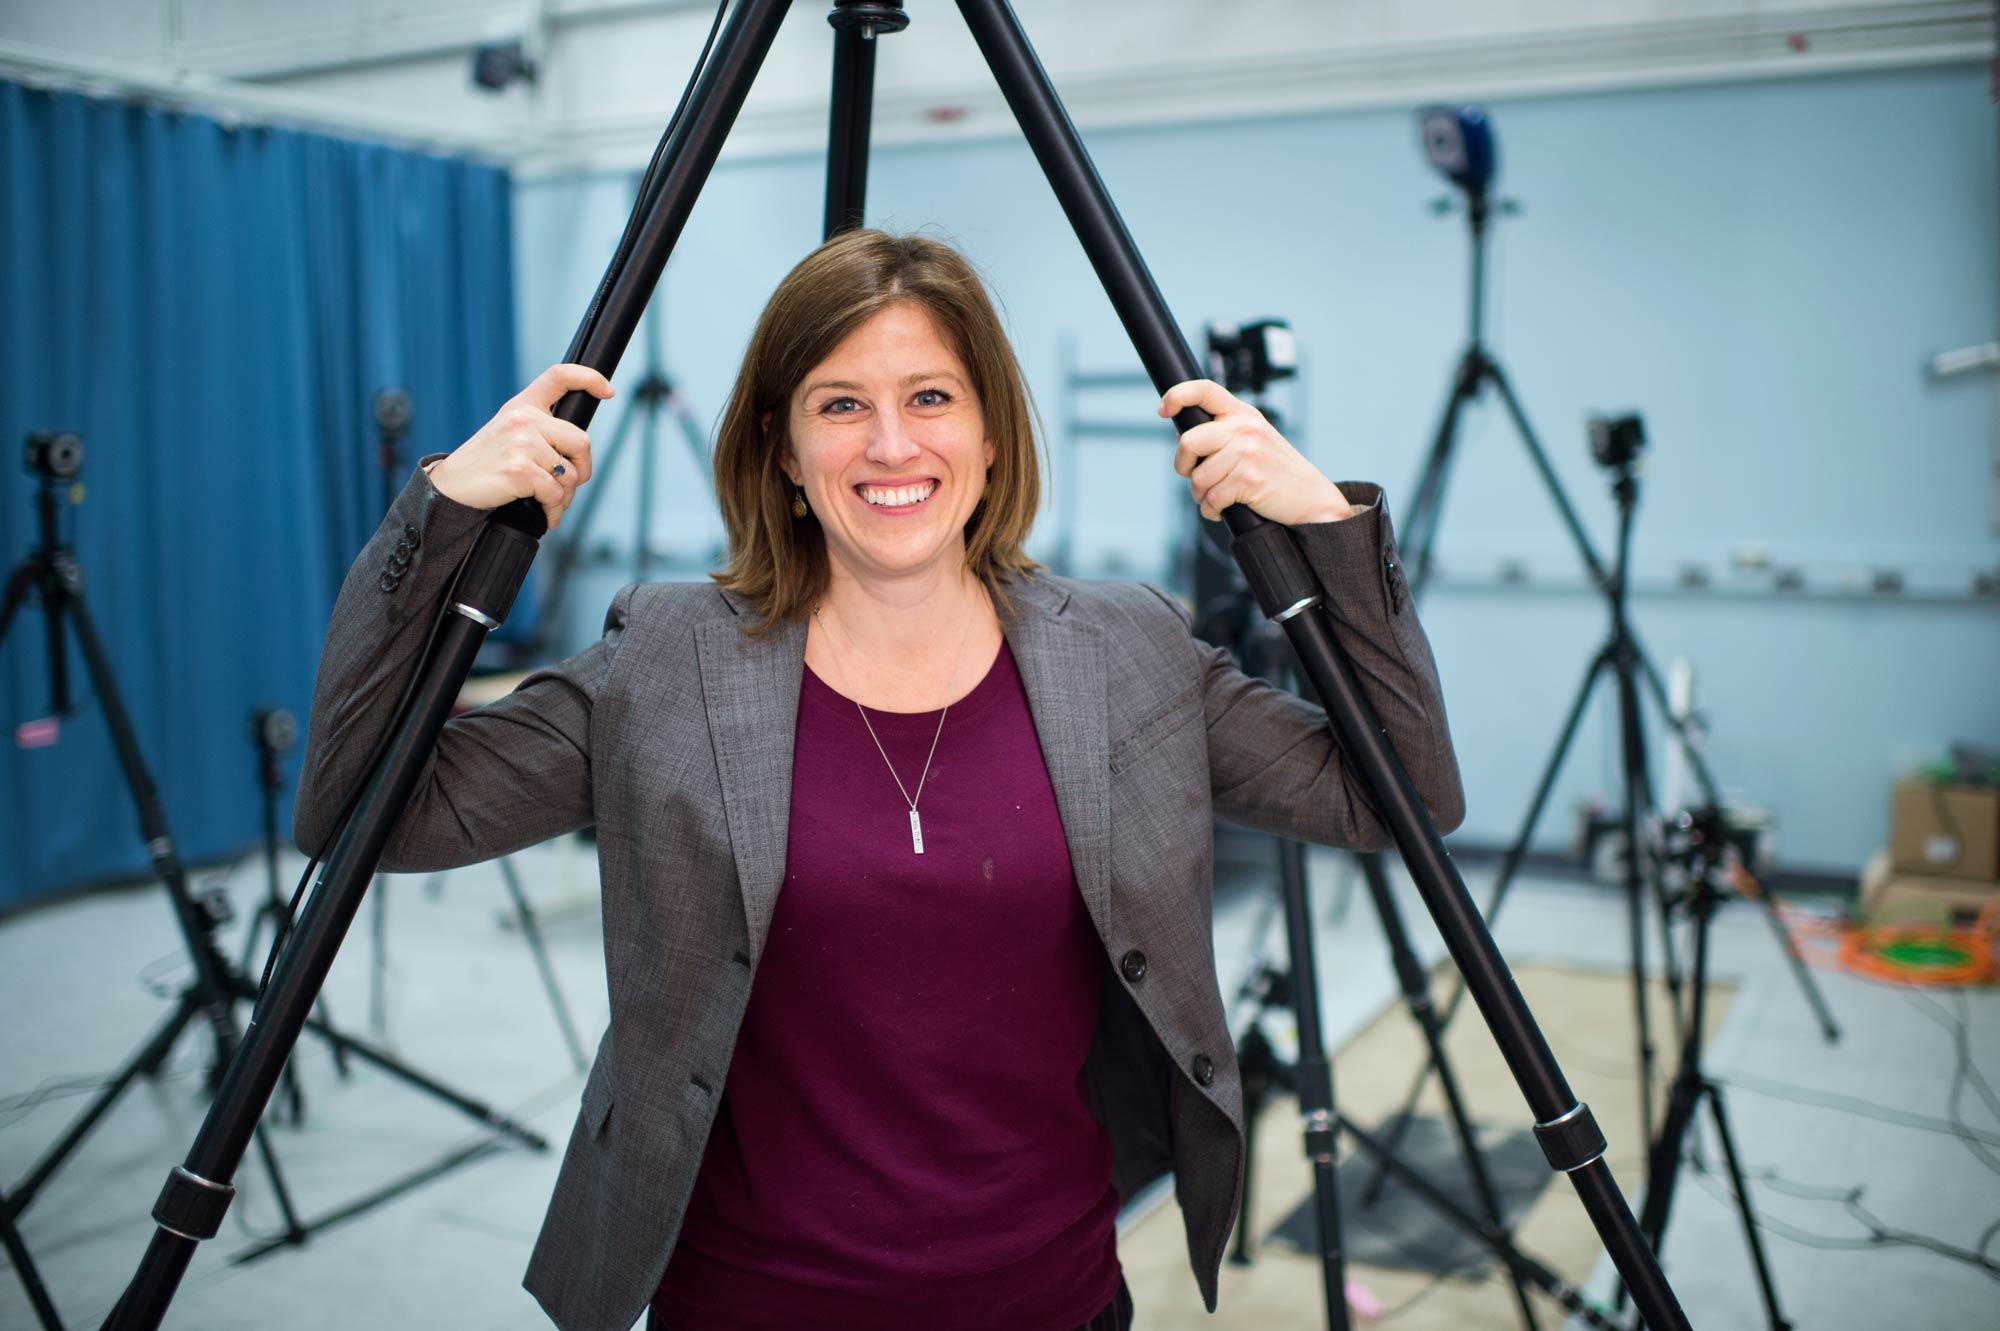 Deanna Gates, director of the Rehabilitation Biomechanics Laboratory at the University of Michigan. Image credit: Austin Thomason, Michigan Photography